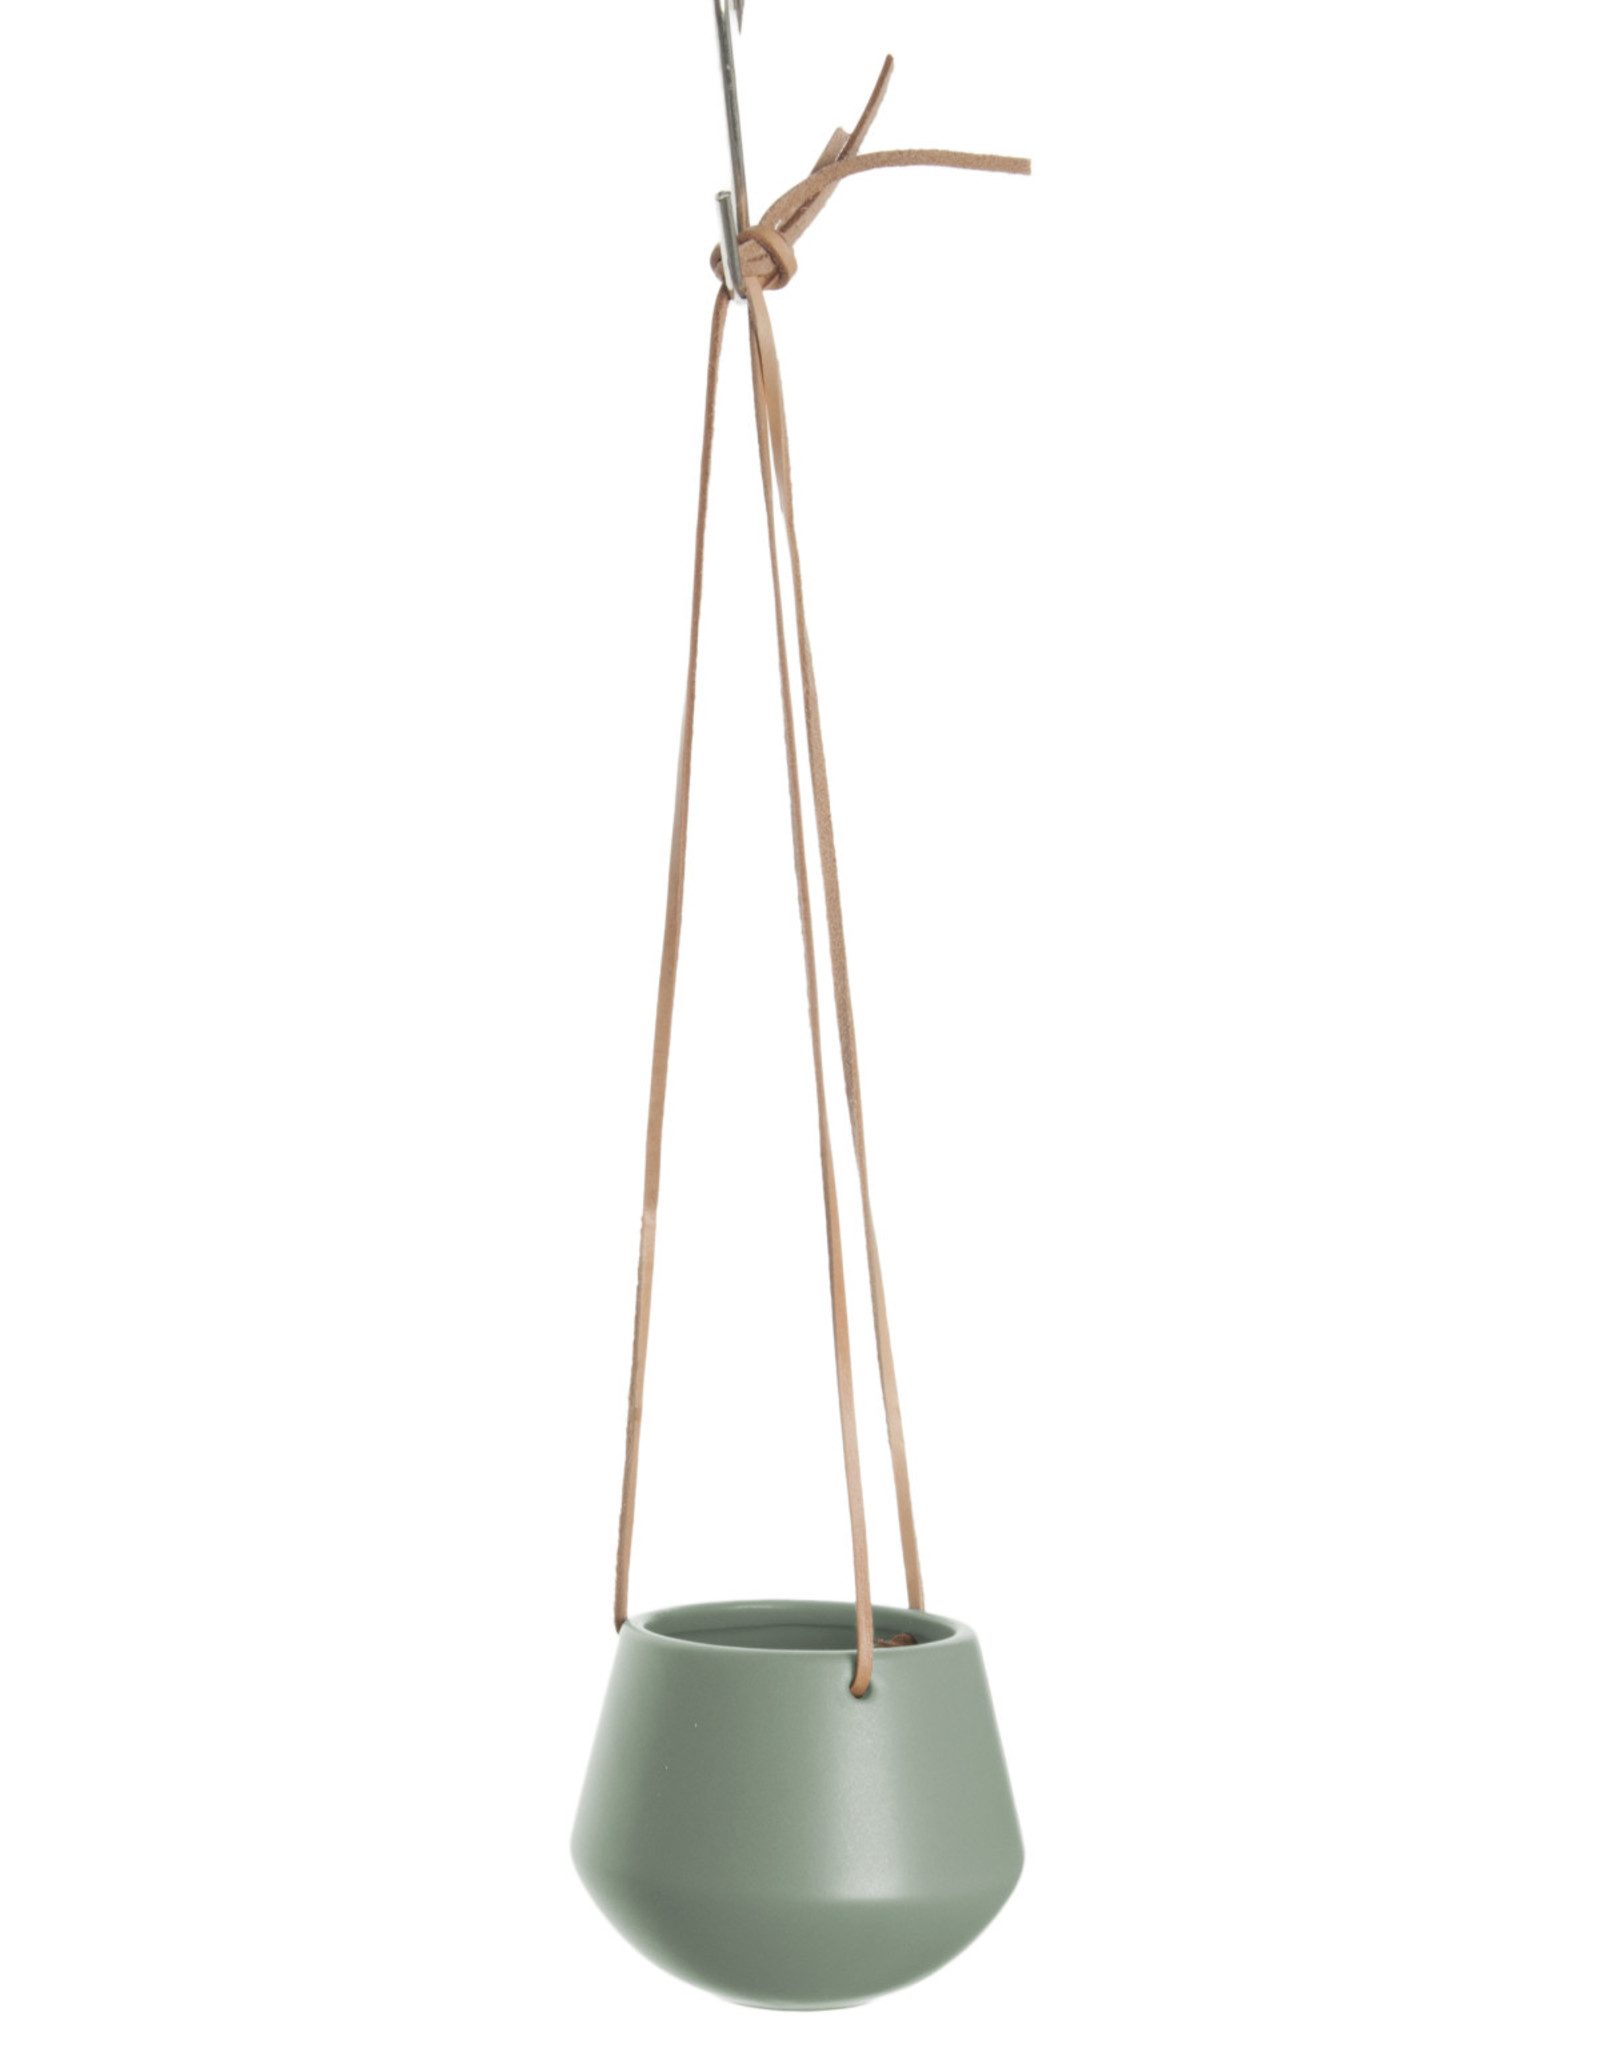 pt Skittle hanging pot Ø8.5 h9 cm - Jungle green